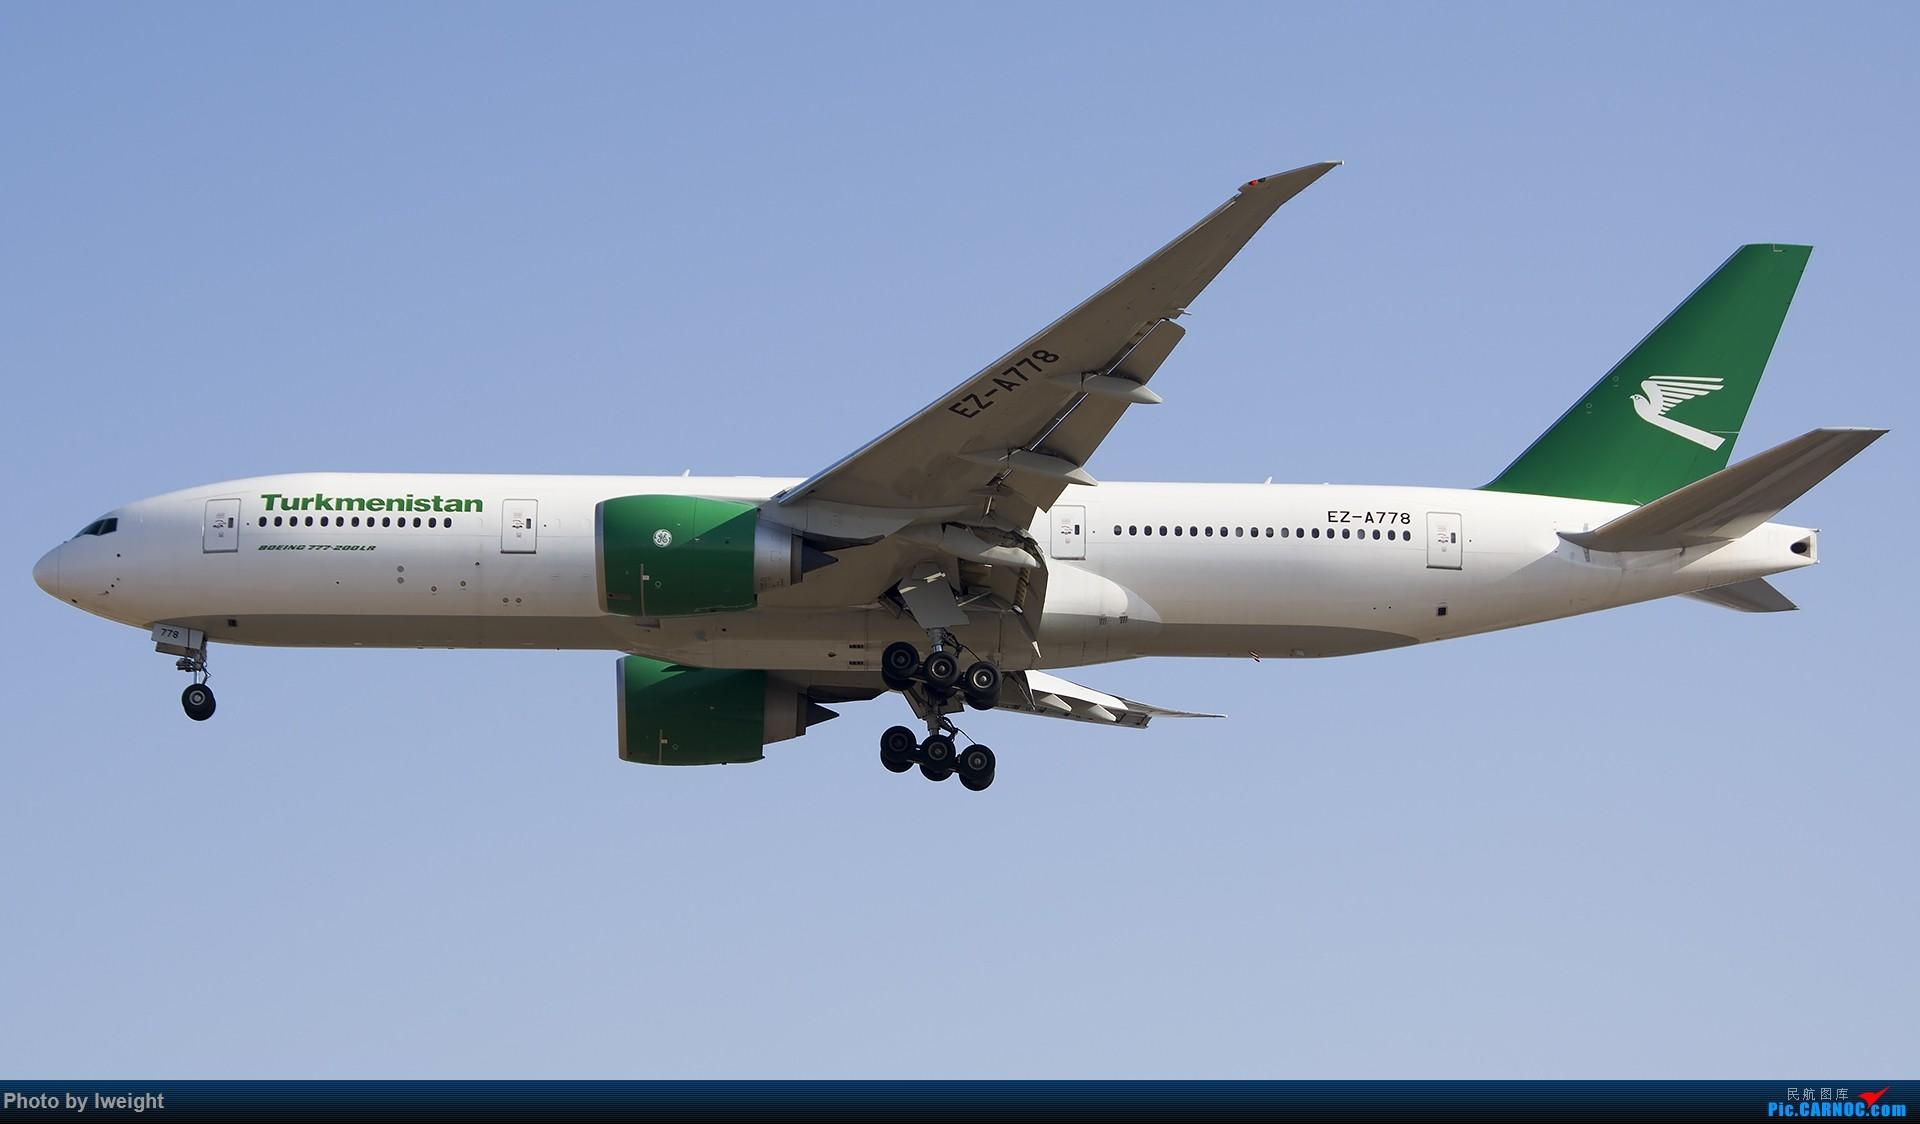 Re:[原创]庆祝升级777,发上今天在首都机场拍的所有飞机【2014-12-14】 BOEING 777-200LR EZ-A778 中国北京首都国际机场